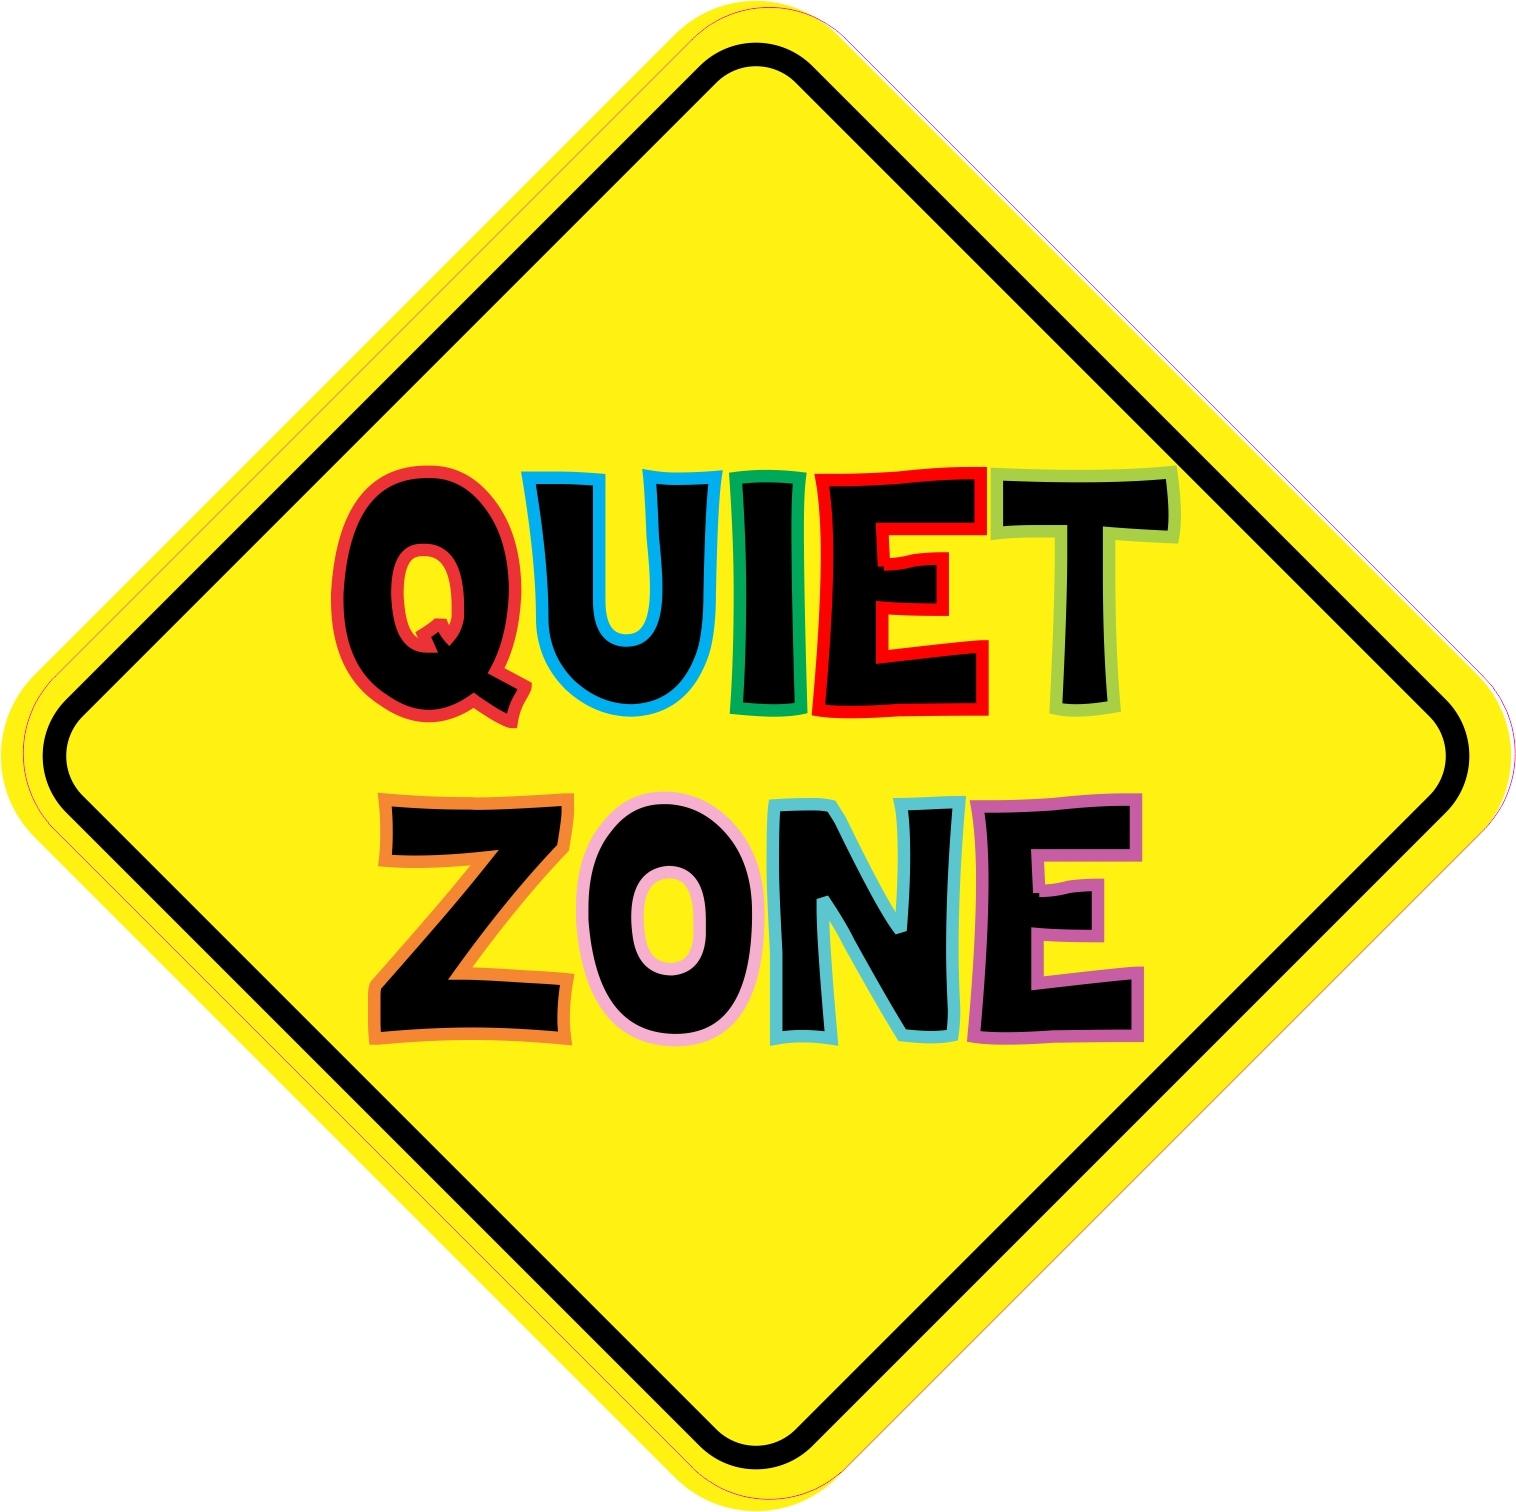 Be quiet signs clipart clip art stock Best Quiet Clipart #14251 - Clipartion.com clip art stock